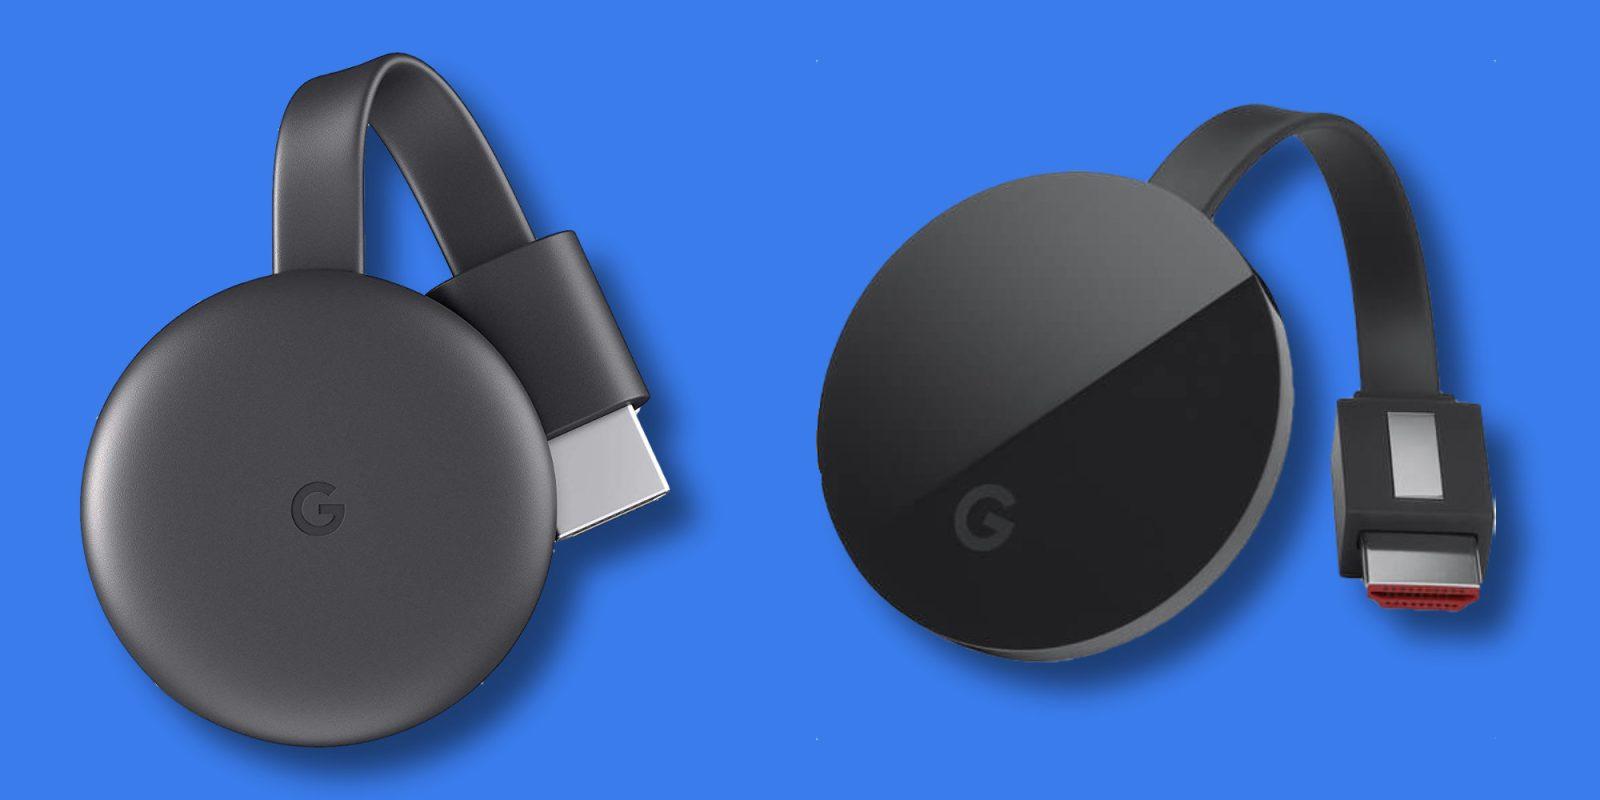 Google Chromecast Ultra lets you fling 4K for $46 (Reg  $69), more